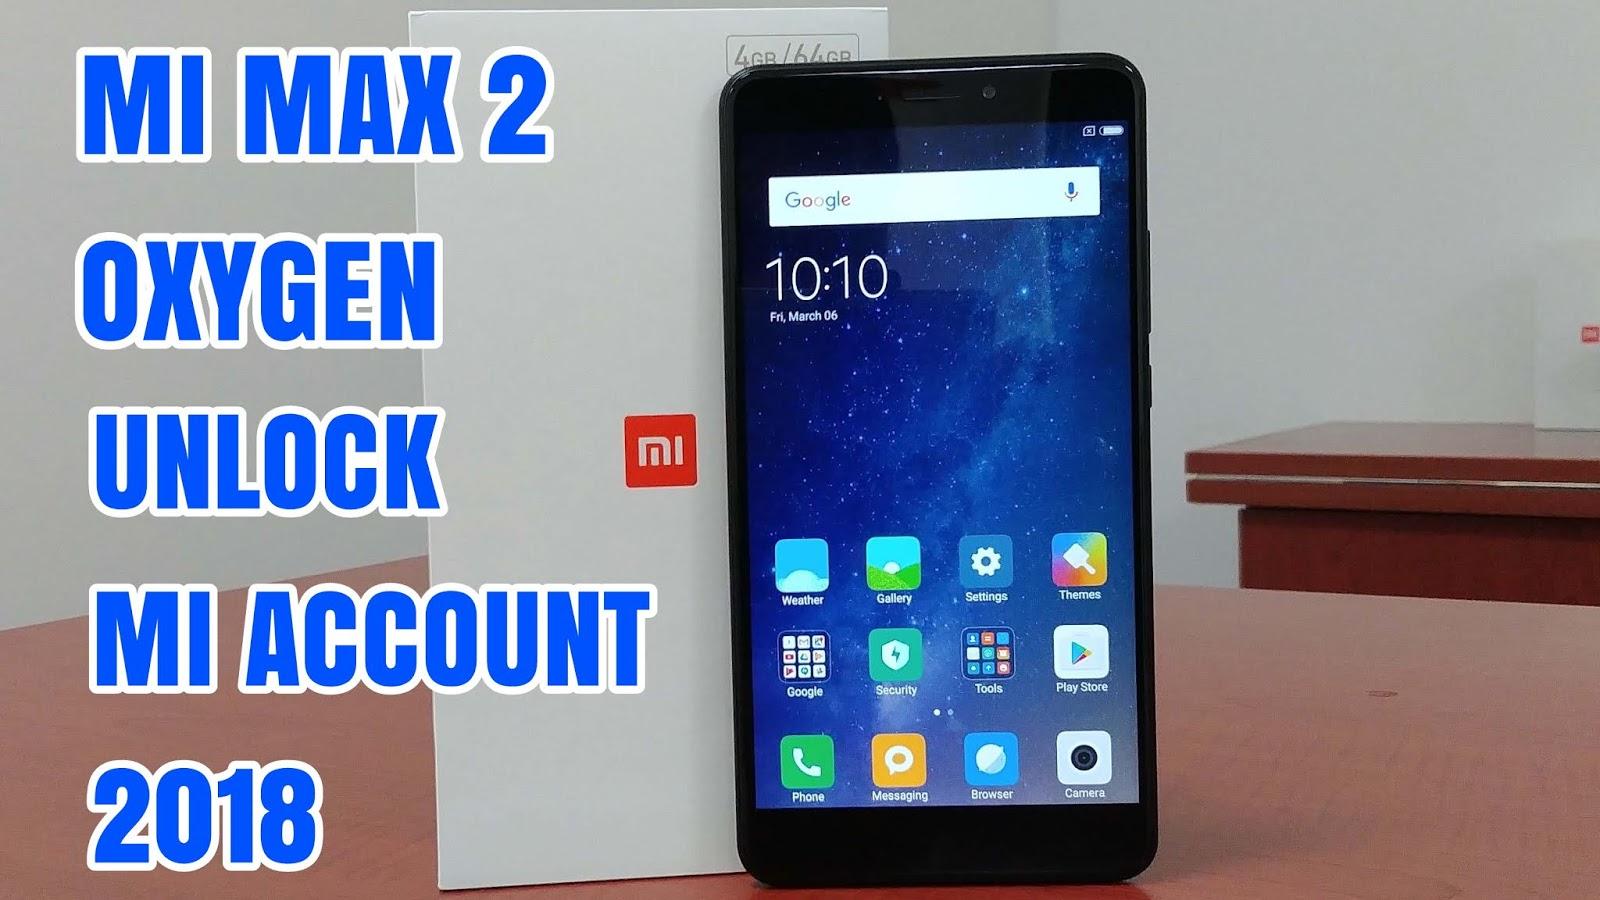 Xiaomi Mi Max 2 Oxygen Cara Mudah Unlock/Remove Mi Account